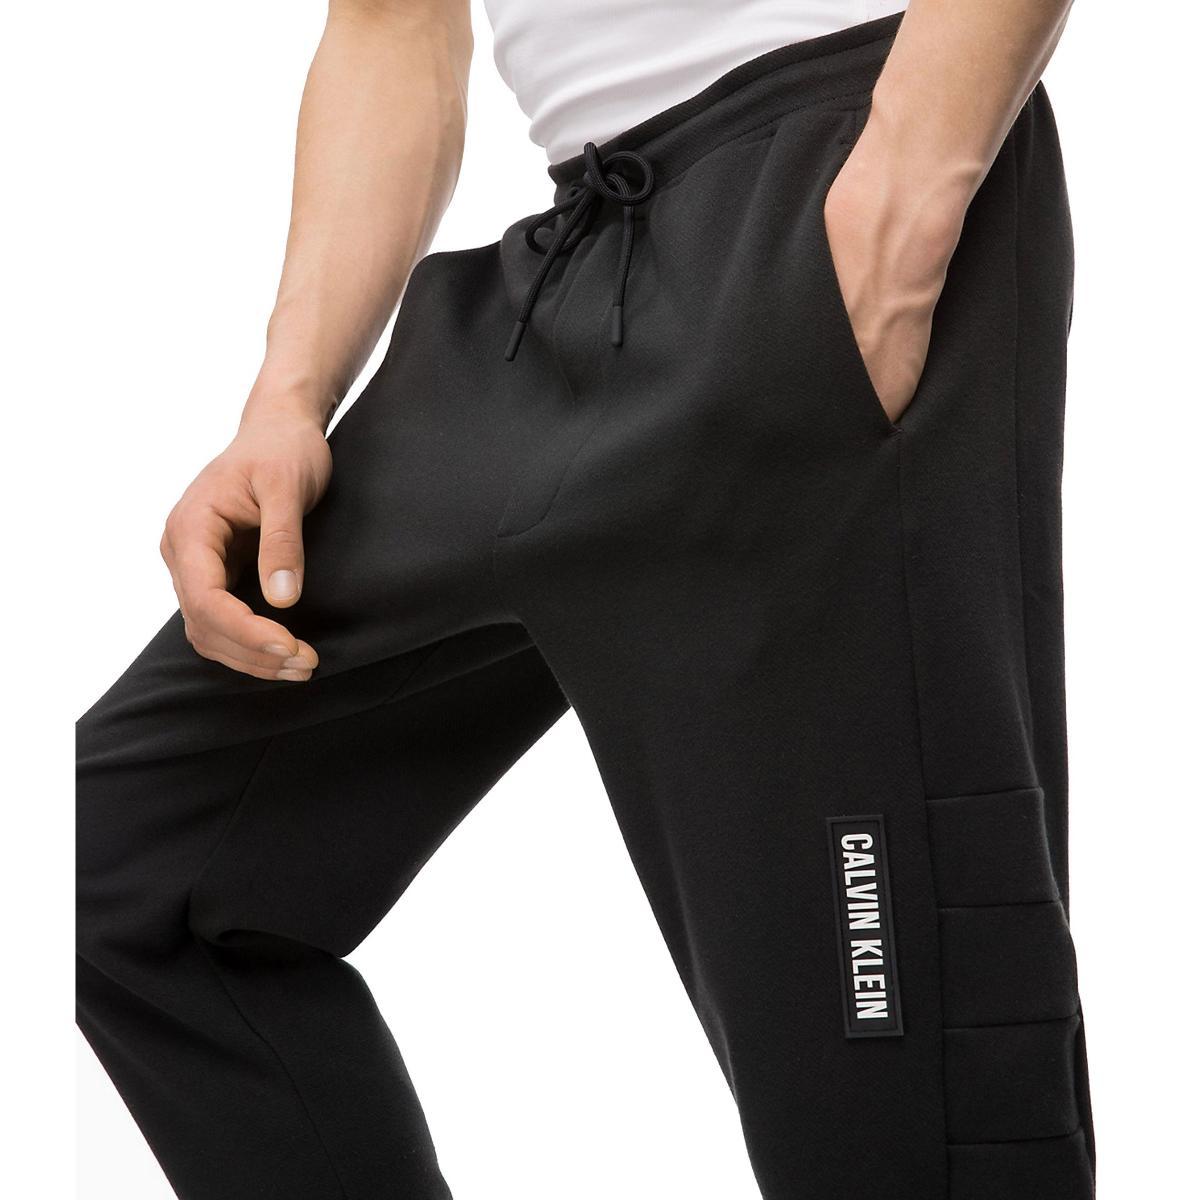 Pantaloni tuta Calvin Klein da uomo Rif. 00GMF8P622